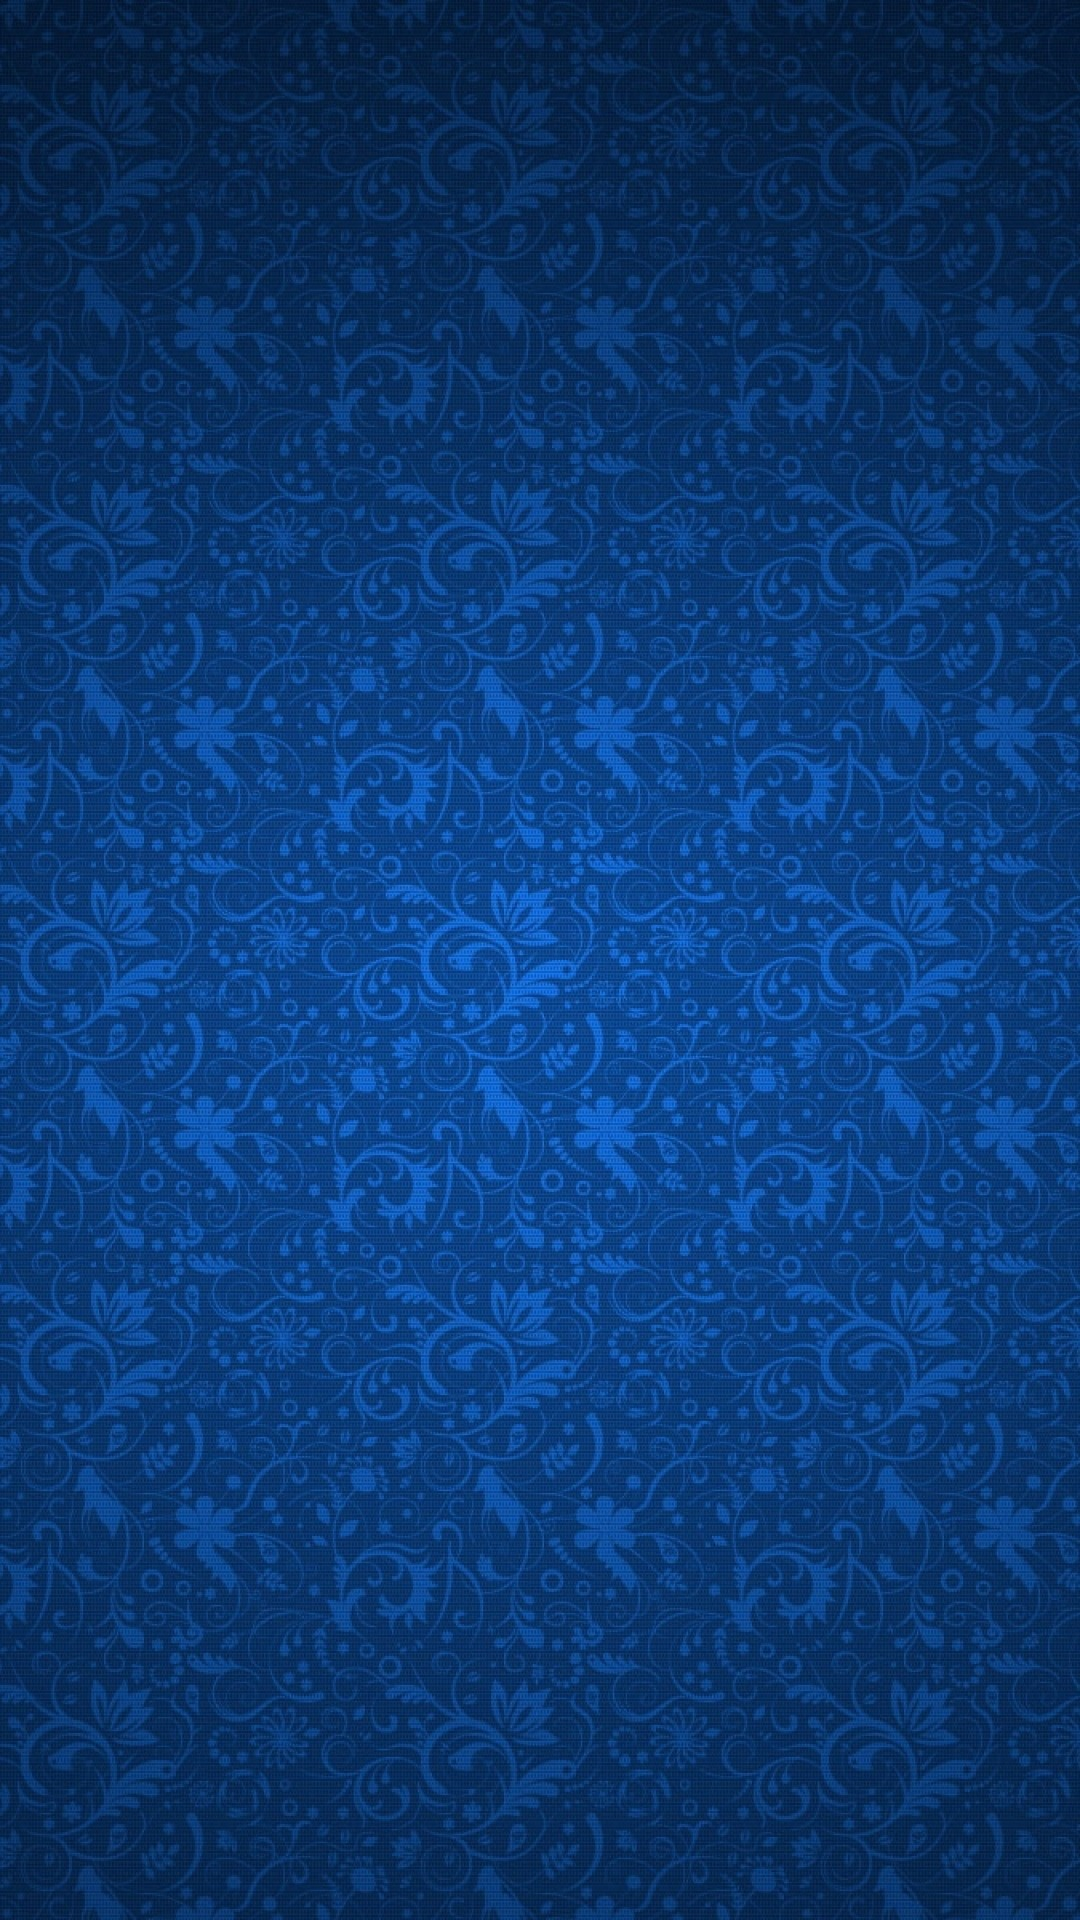 Wallpaper patterns, dark, surface, texture